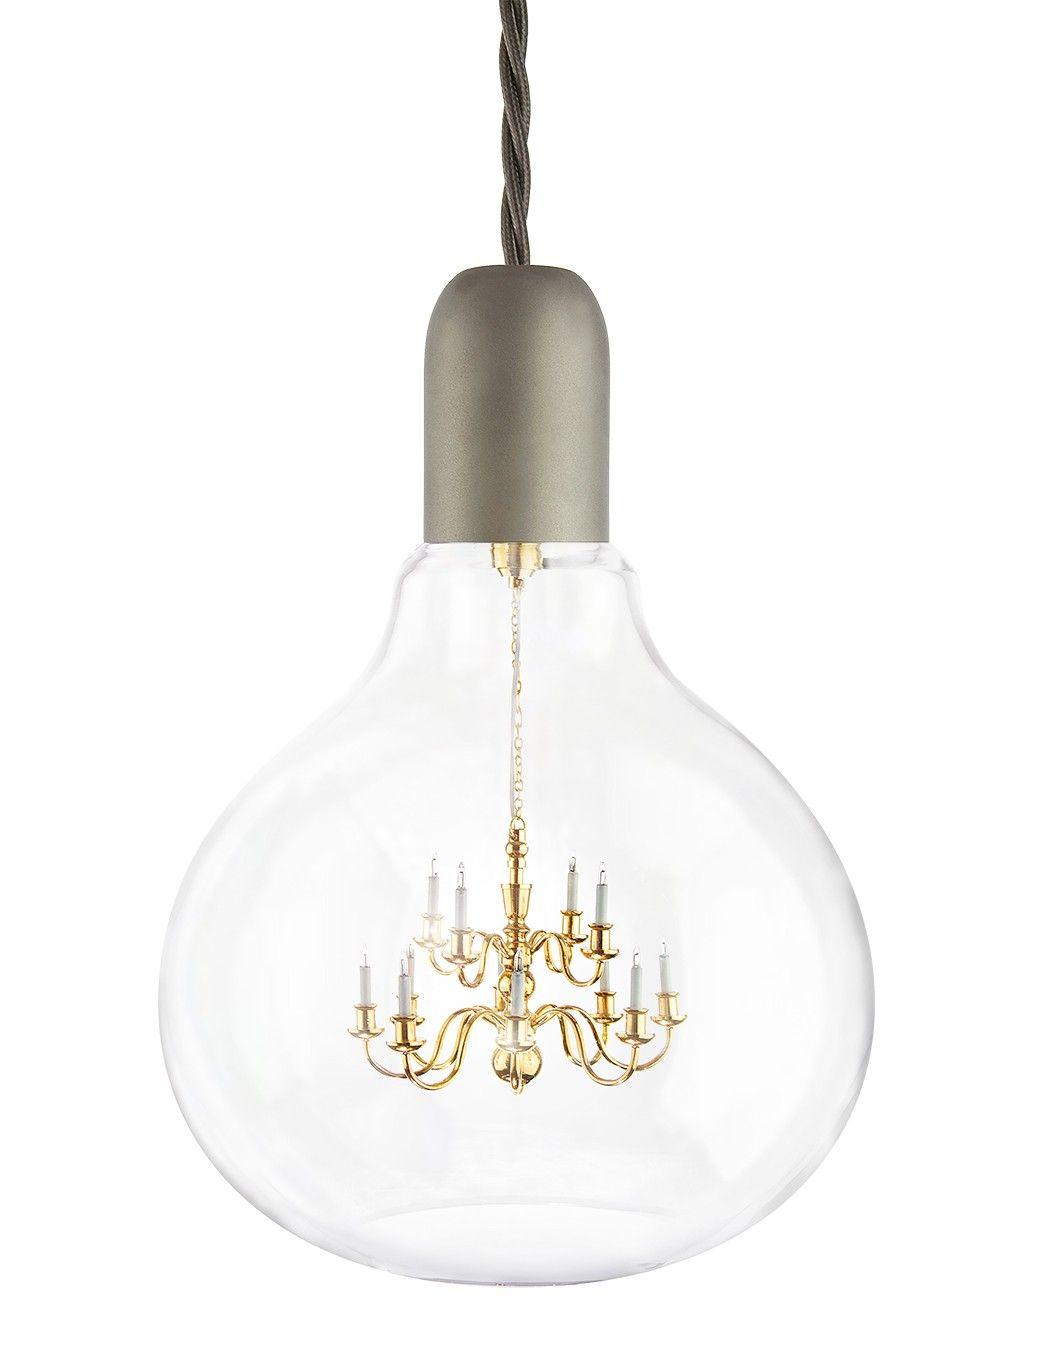 King edison pendant lamp theres a fully functional miniature king edison pendant lamp theres a fully functional miniature chandelier inside this bulb brilliant arubaitofo Gallery